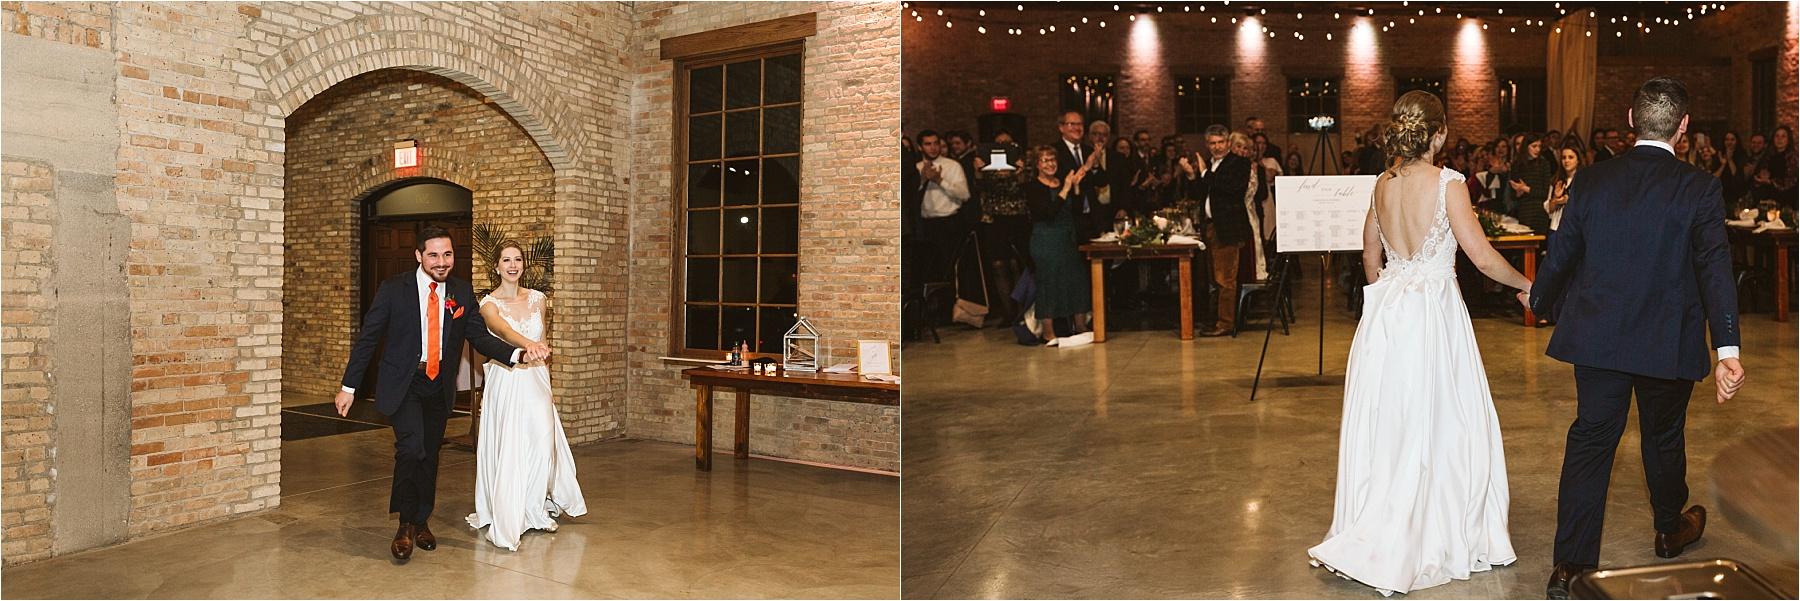 The Brix Wedding_0098.jpg